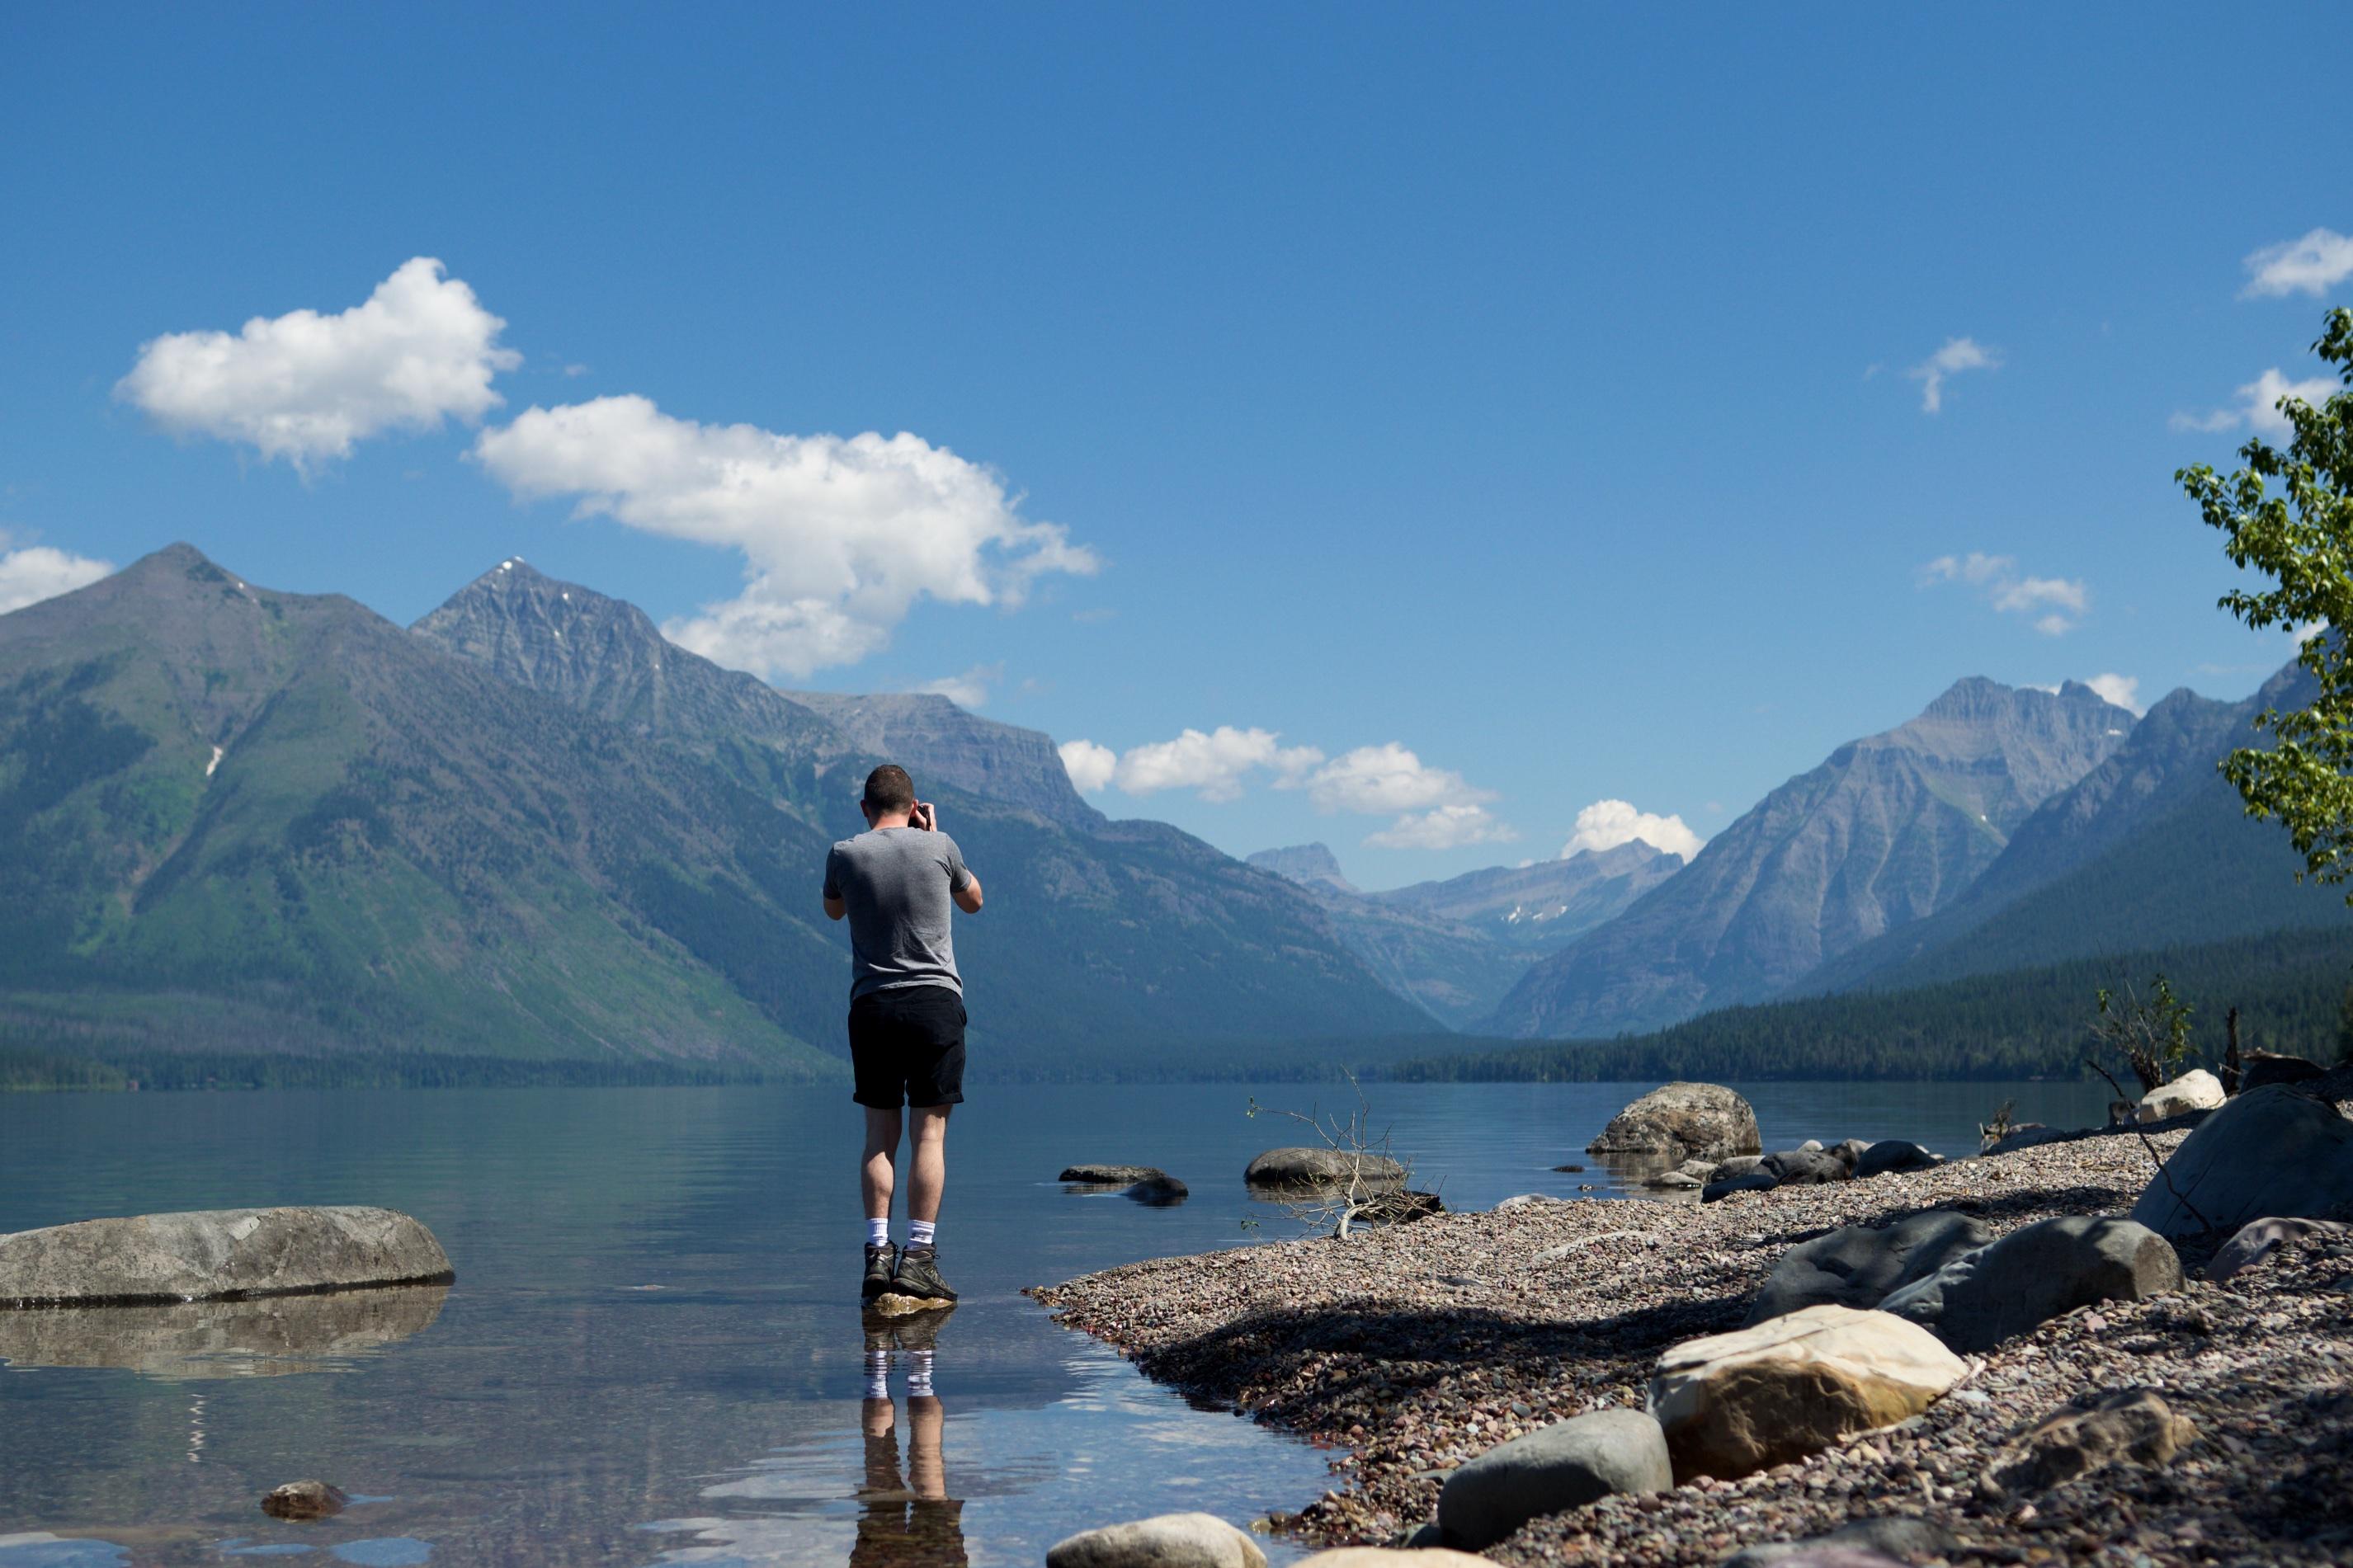 strangers on a lake